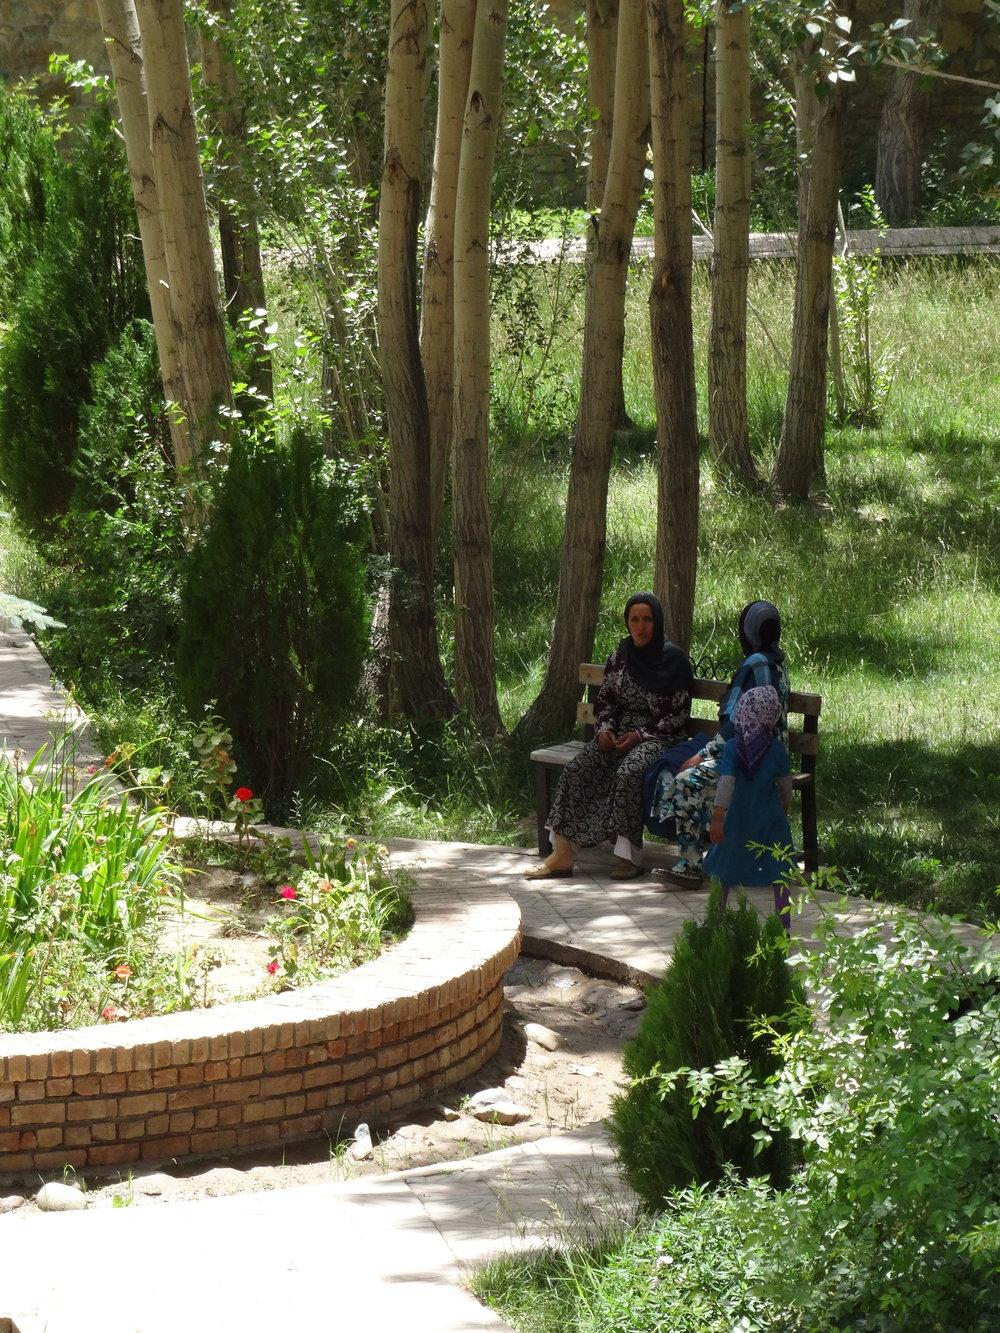 Image 4 Women's Garden, Bamyan, 2016. Photograph by Safira Lakhani